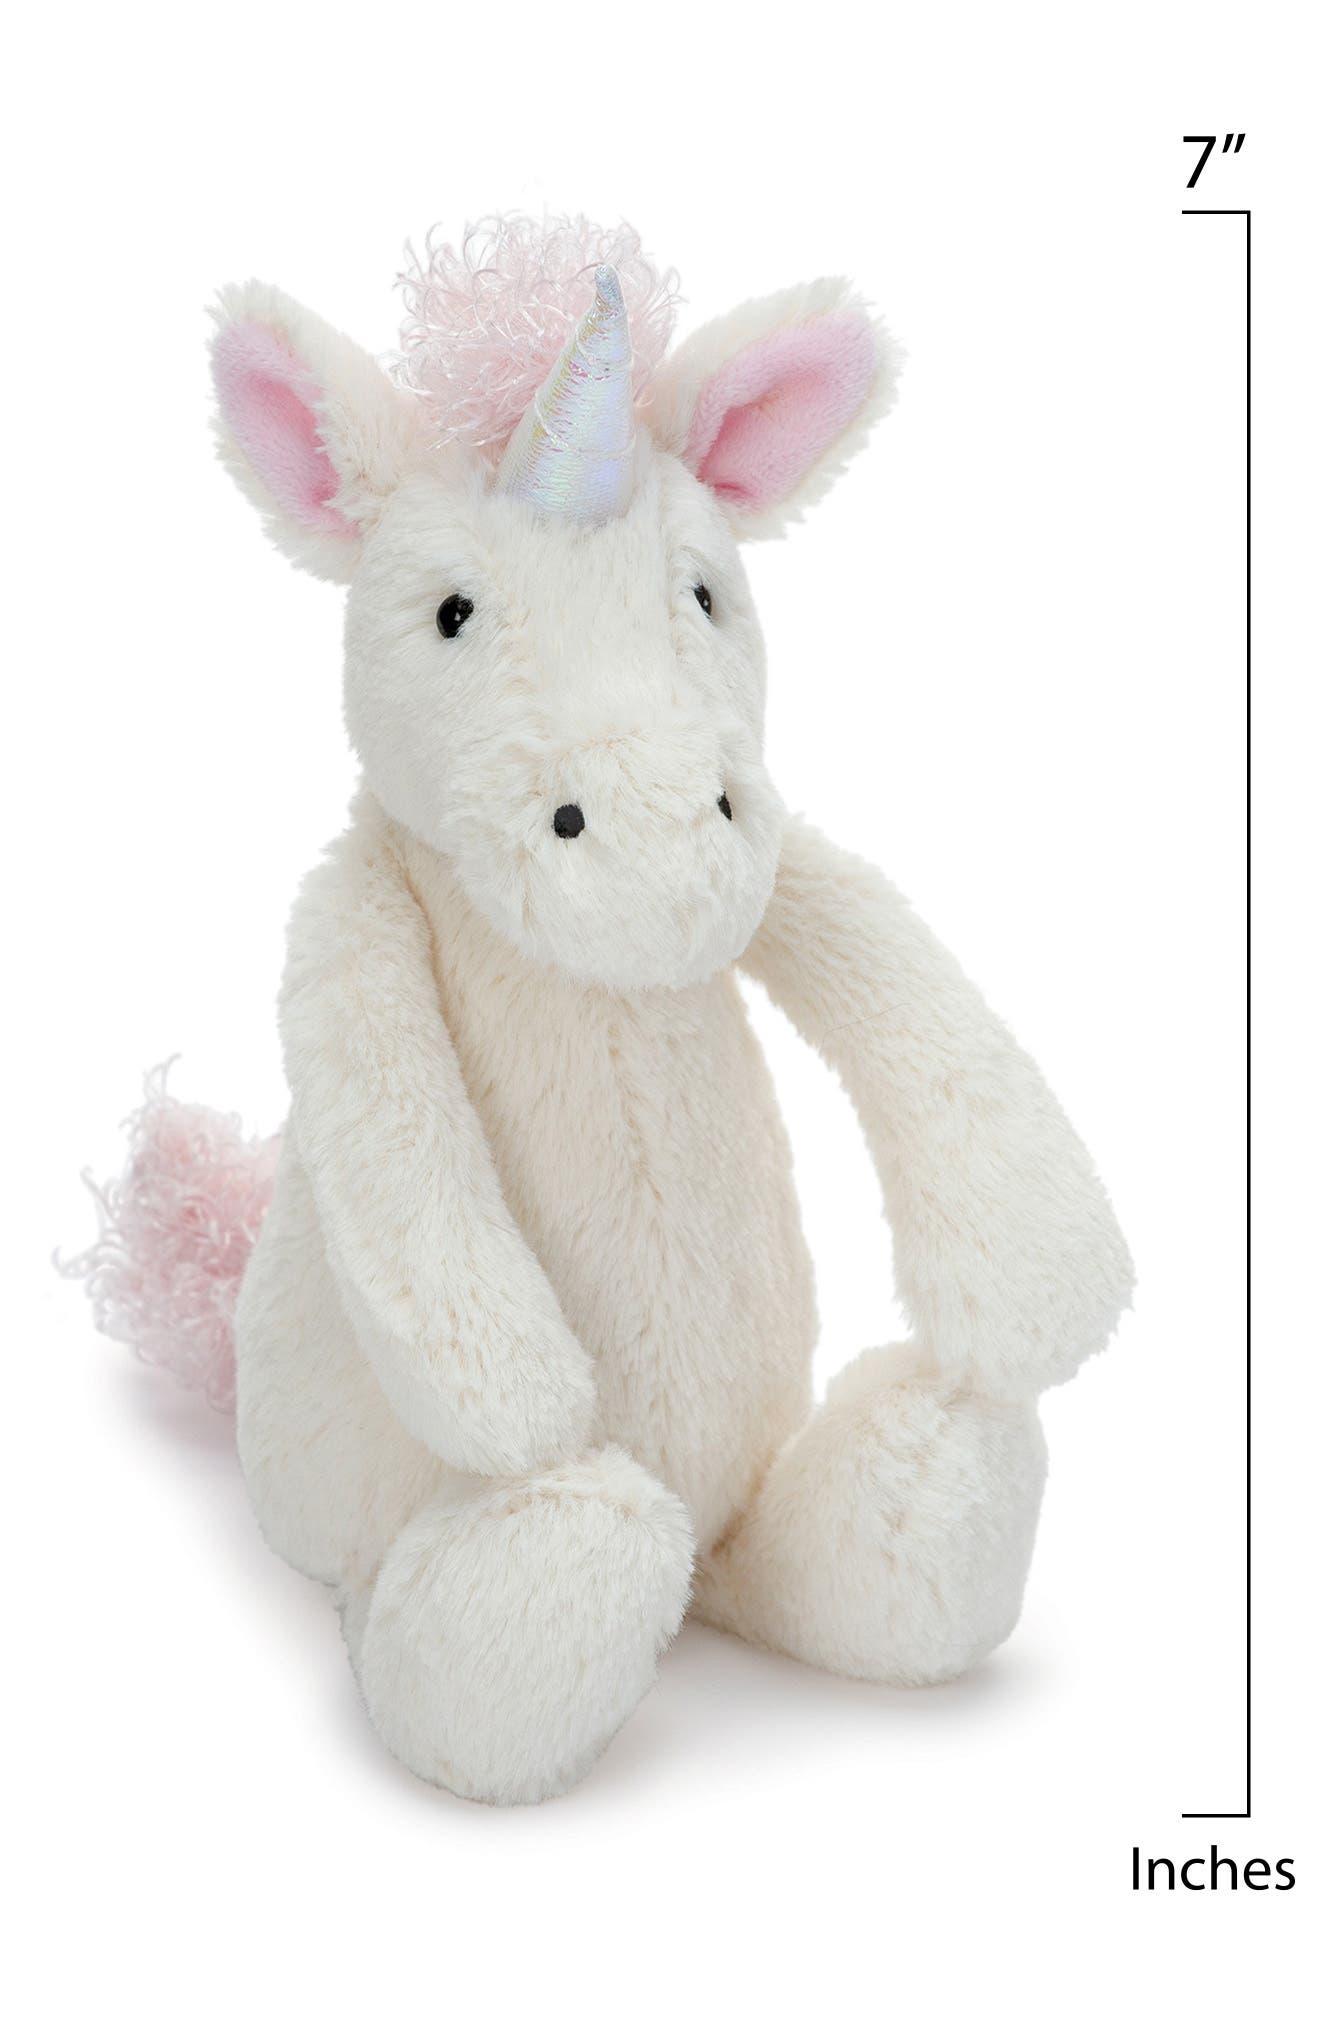 'Small Bashful Unicorn' Stuffed Animal,                             Alternate thumbnail 2, color,                             CREAM